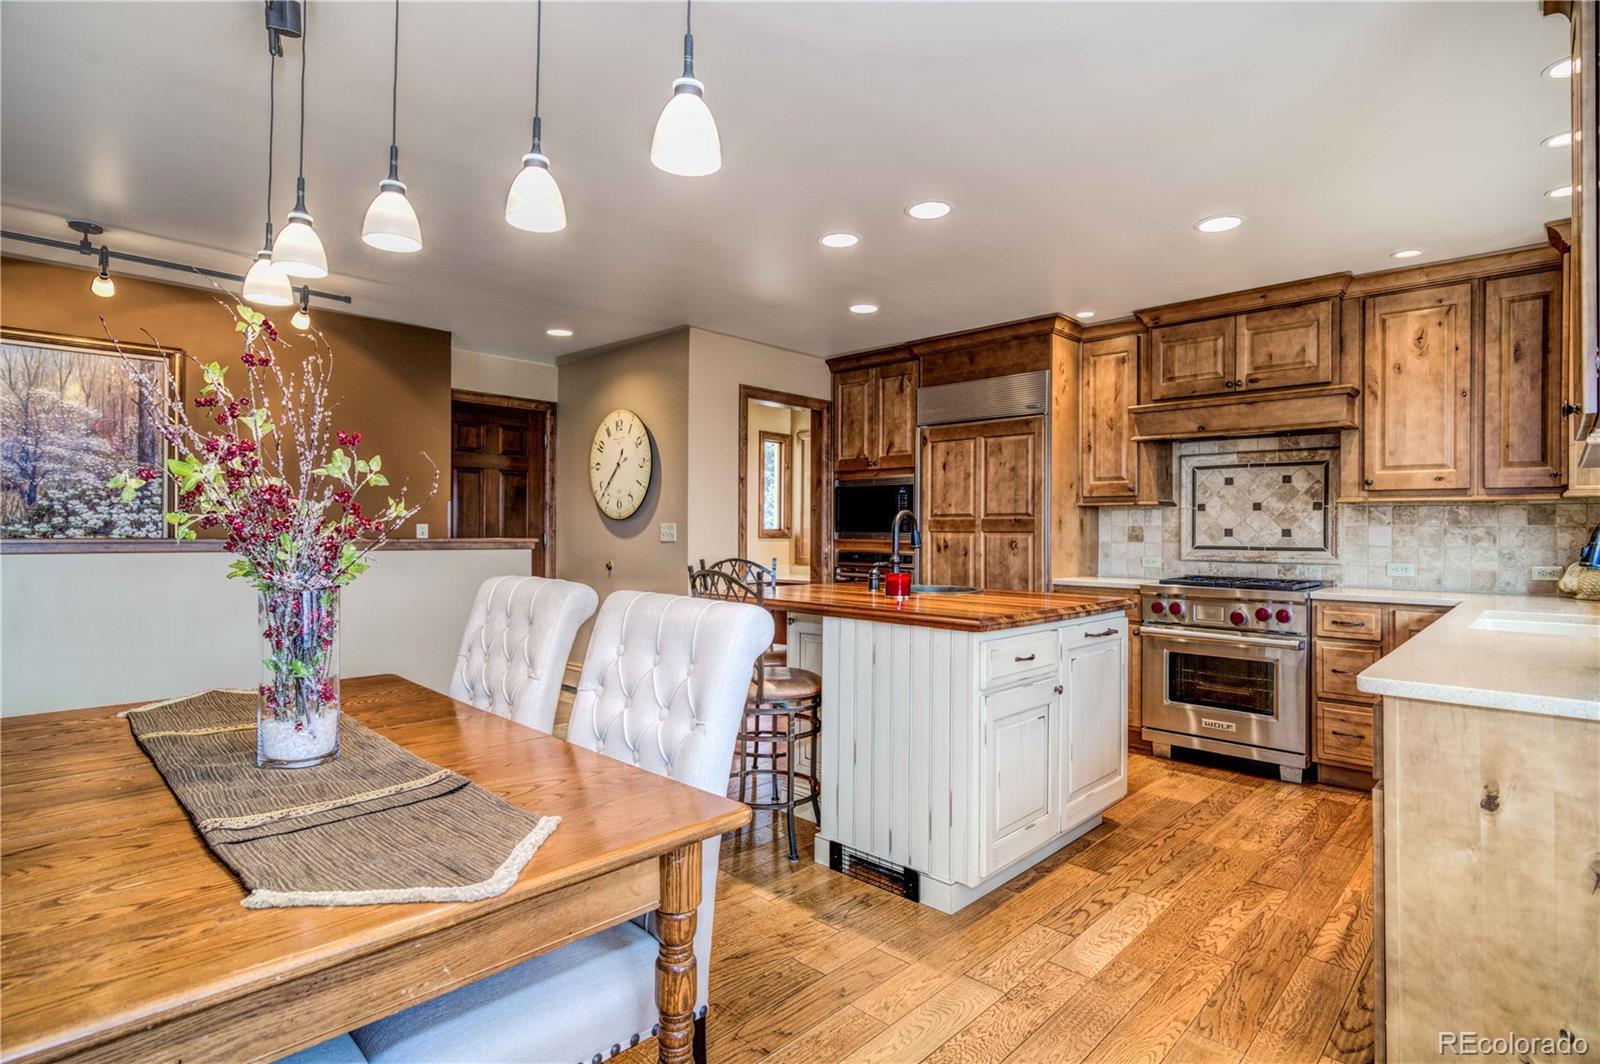 MLS# 5539974 - 11 - 5505 Saddle Rock Place, Colorado Springs, CO 80918